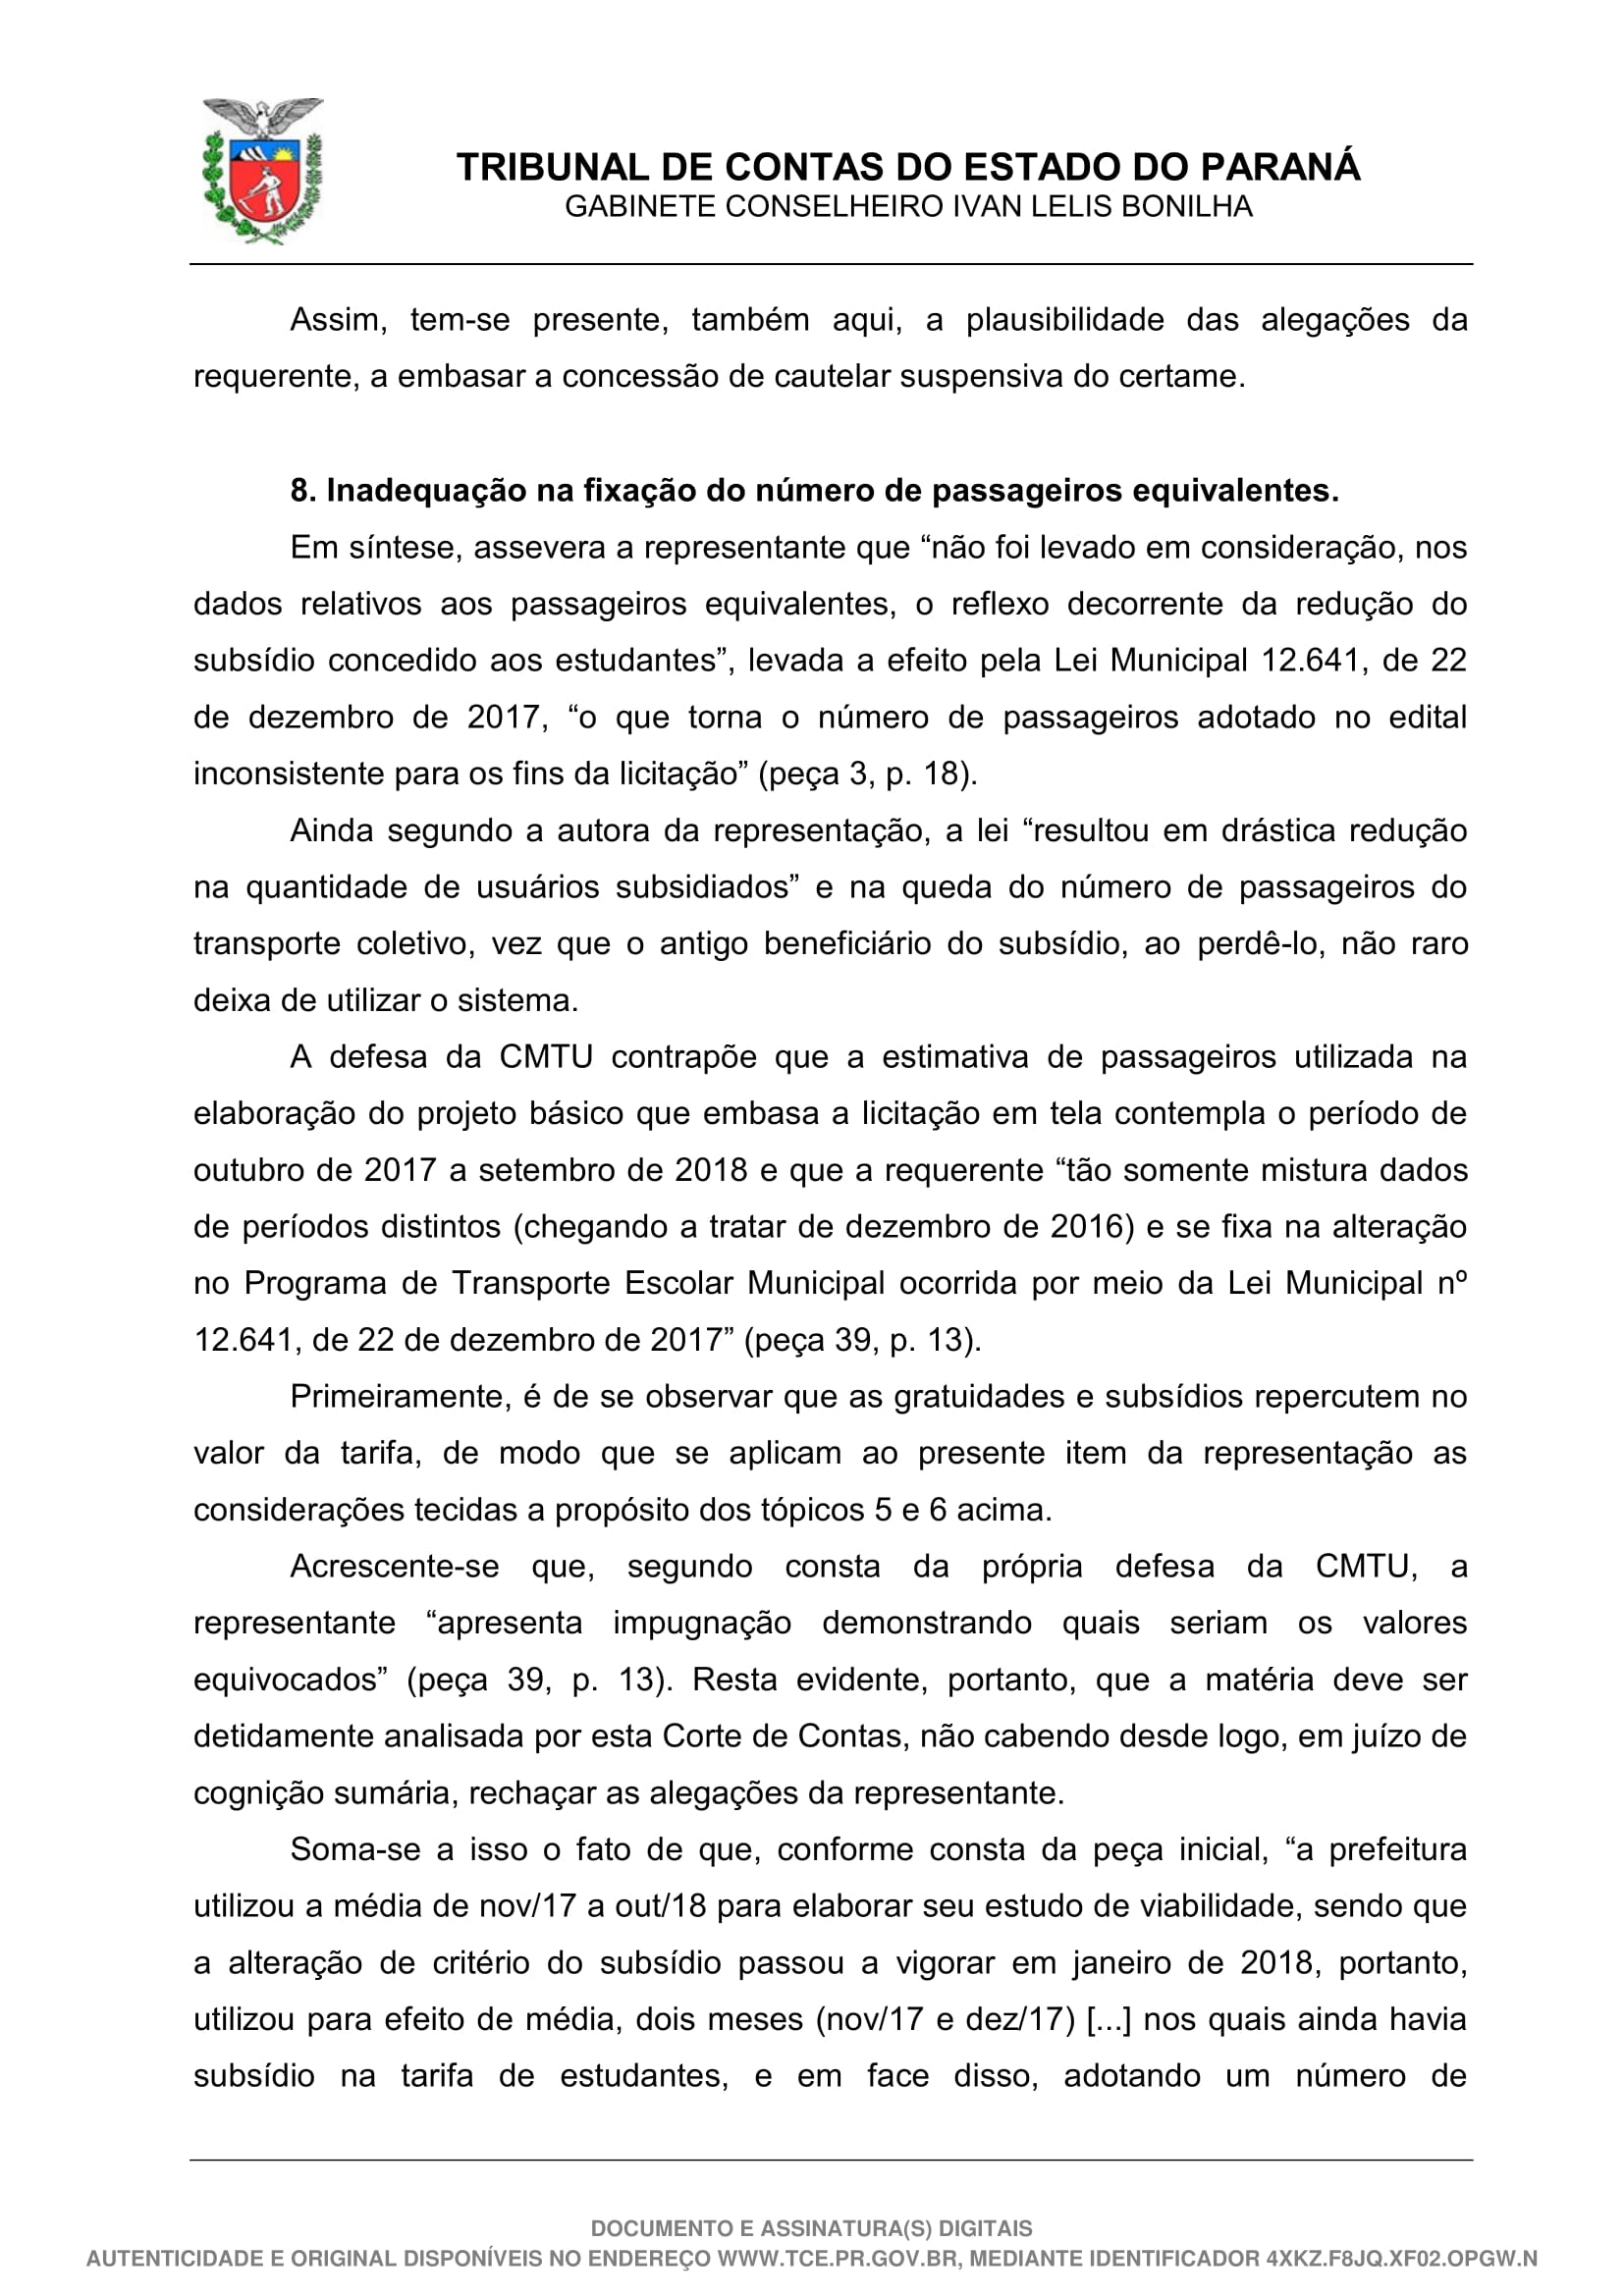 Despacho - 49-19 - GCILB-11